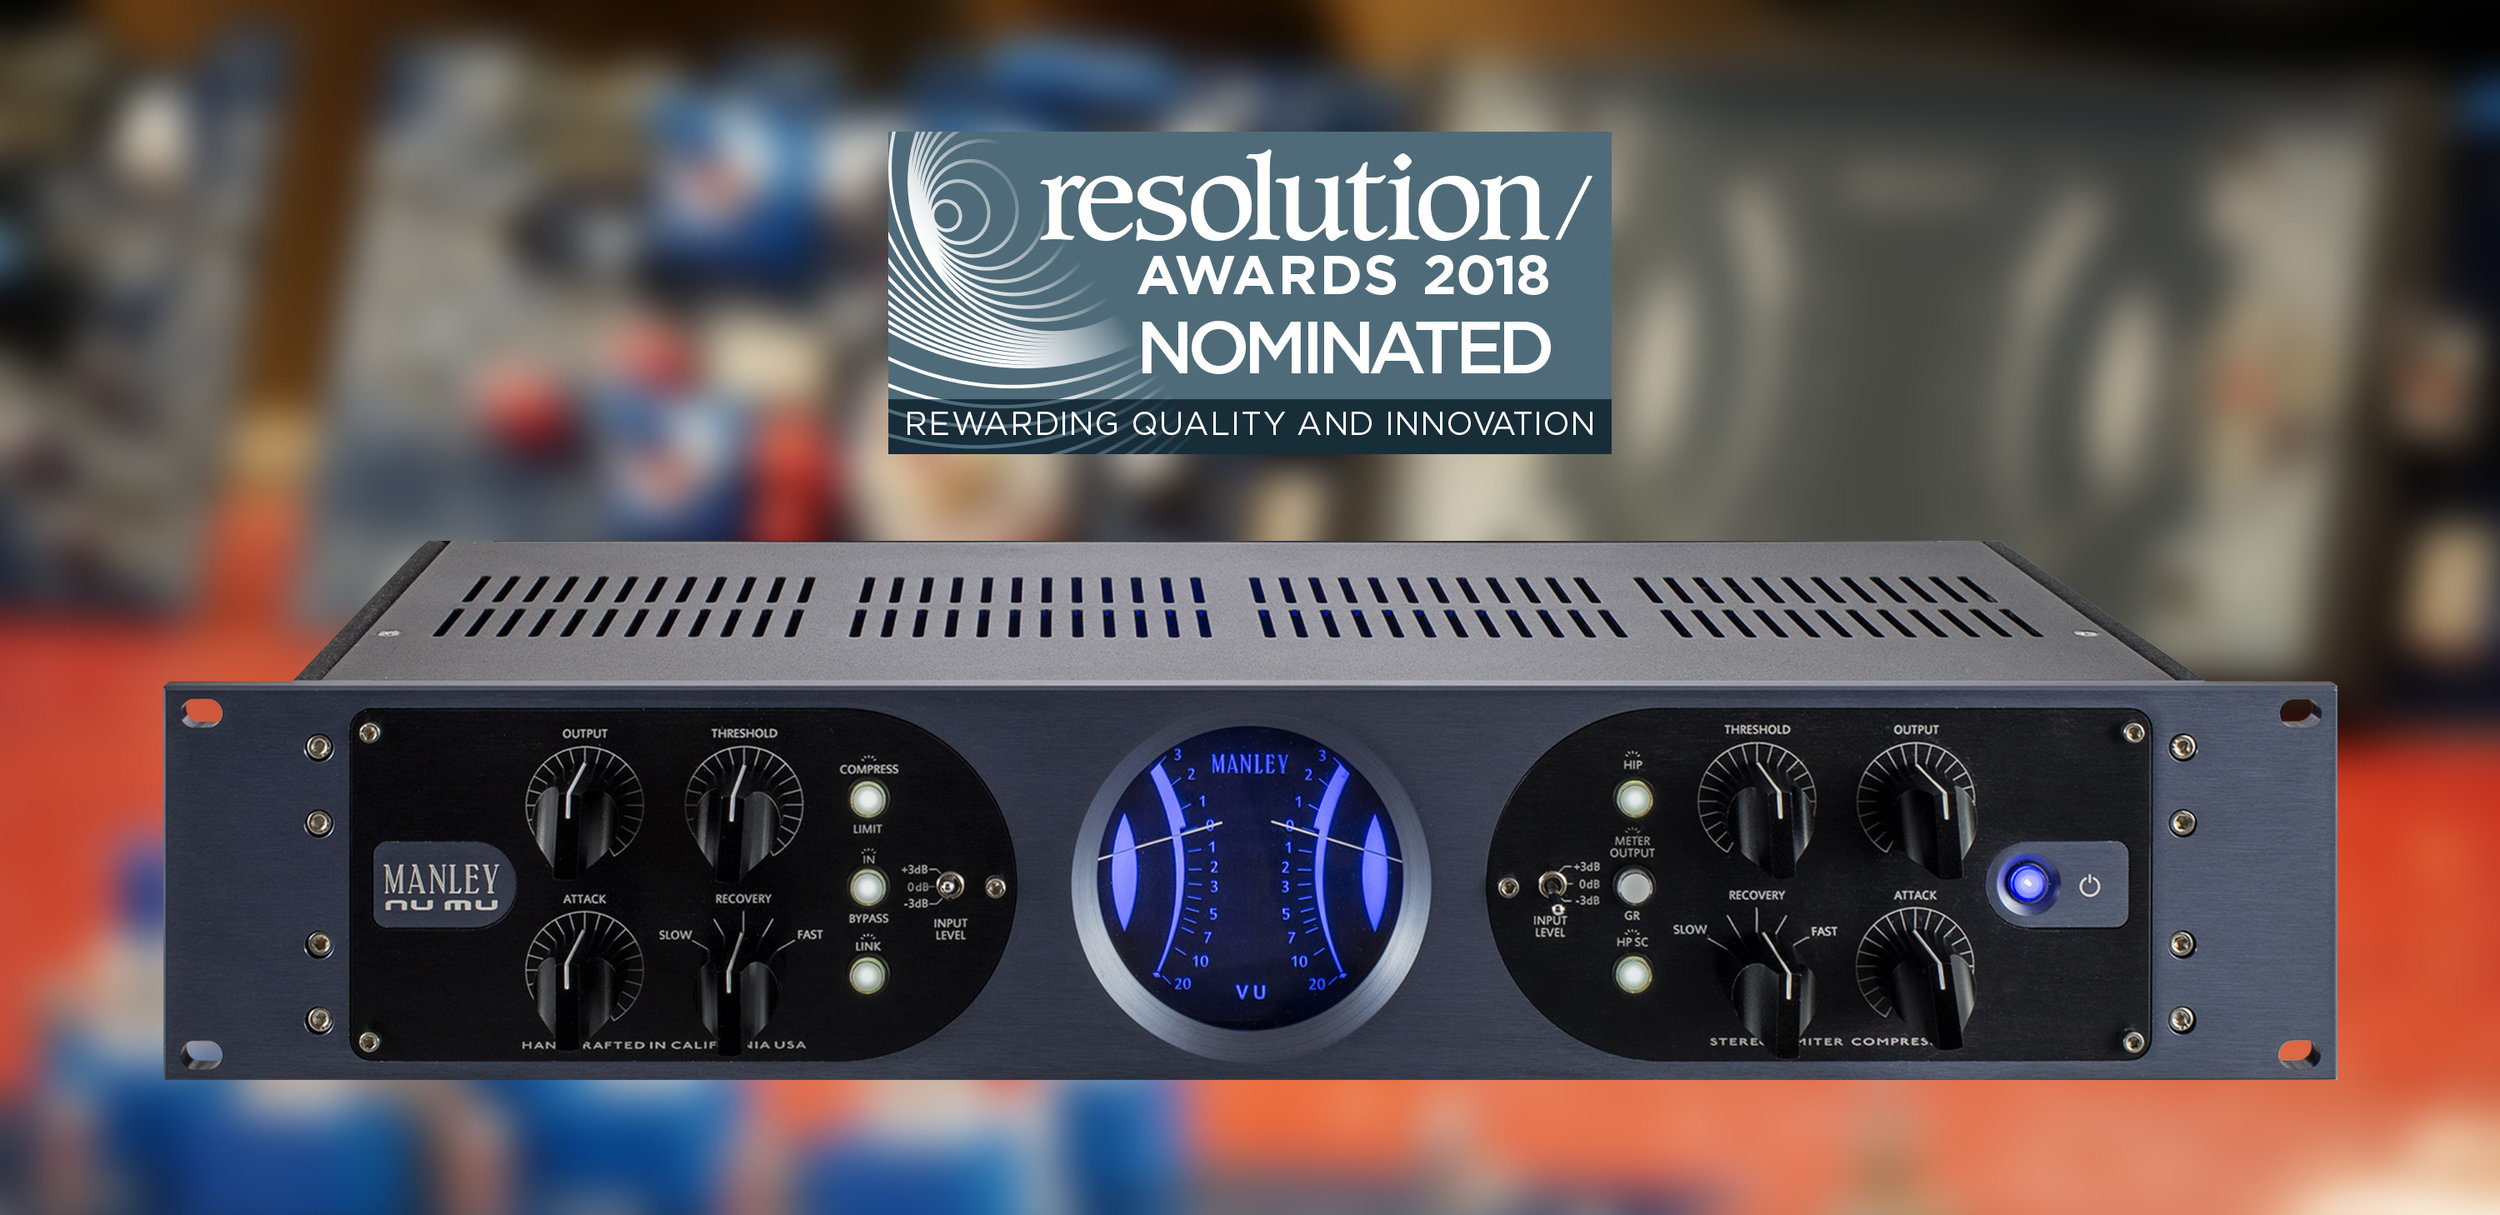 mnumu-resolution-nomination.jpg